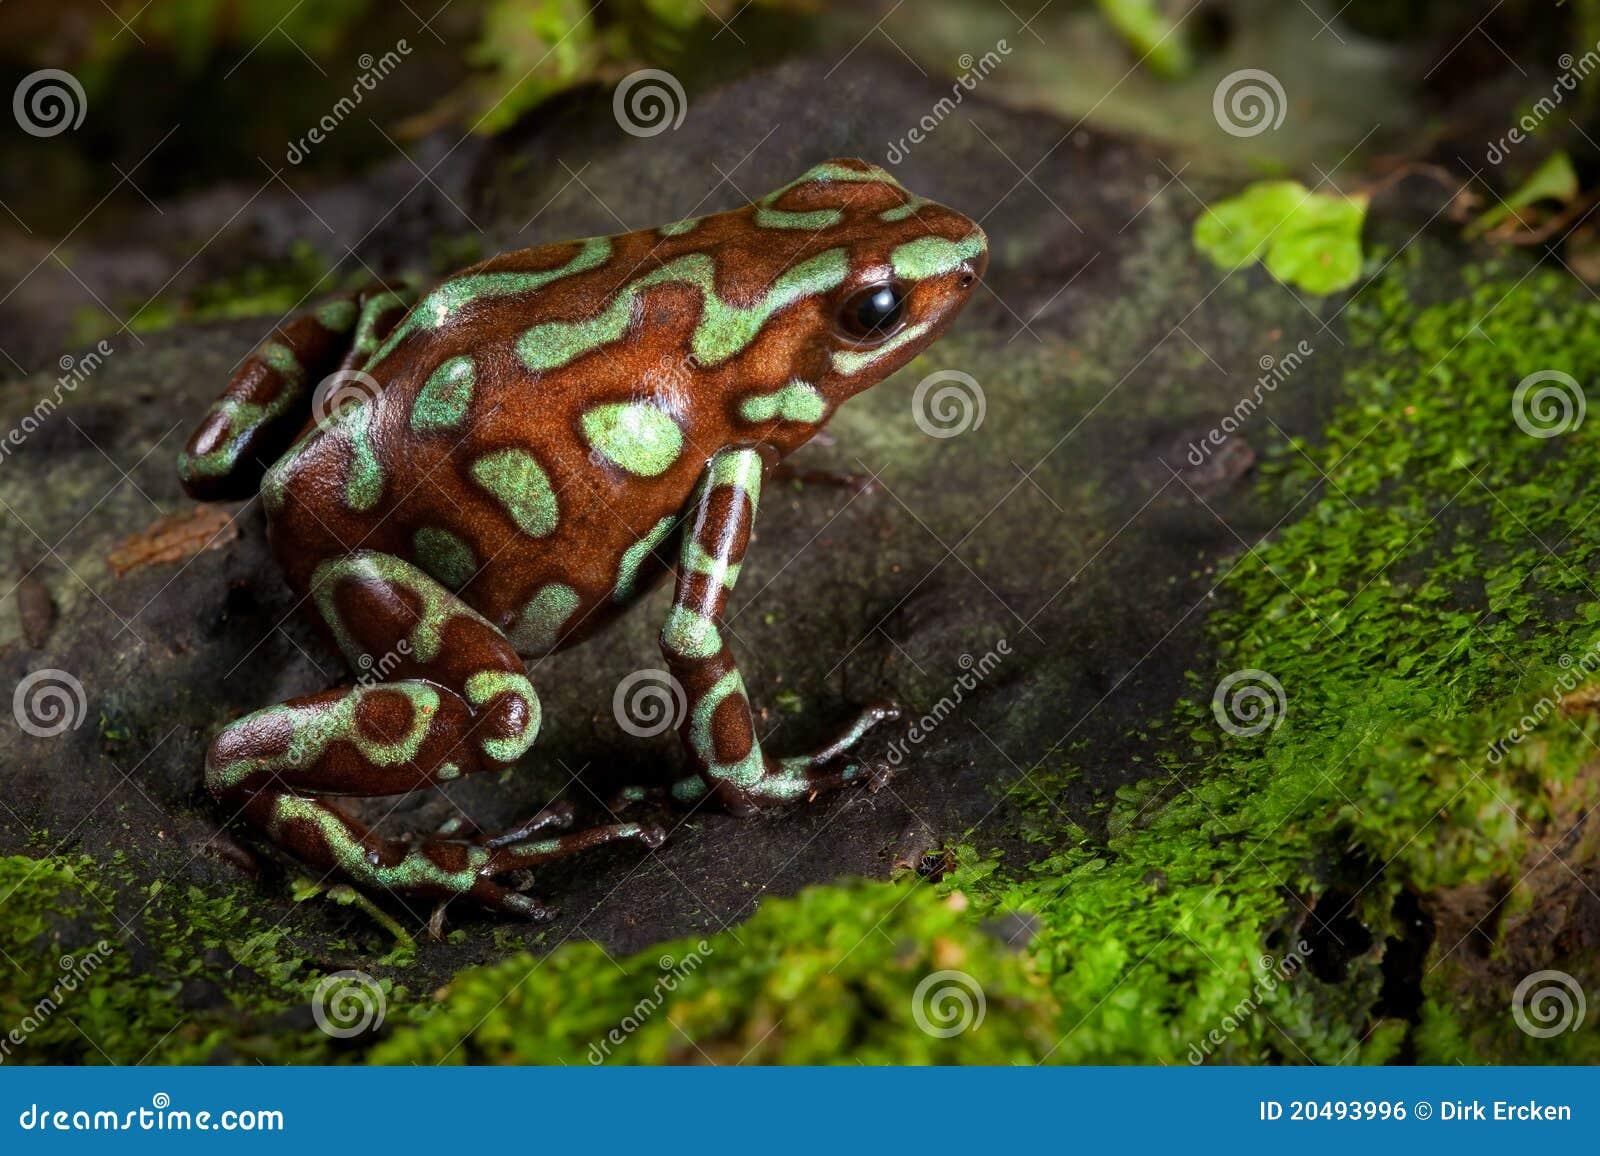 Golden Poison Dart Frog Of Panama Rain Forest Royalty Free Stock Image ...